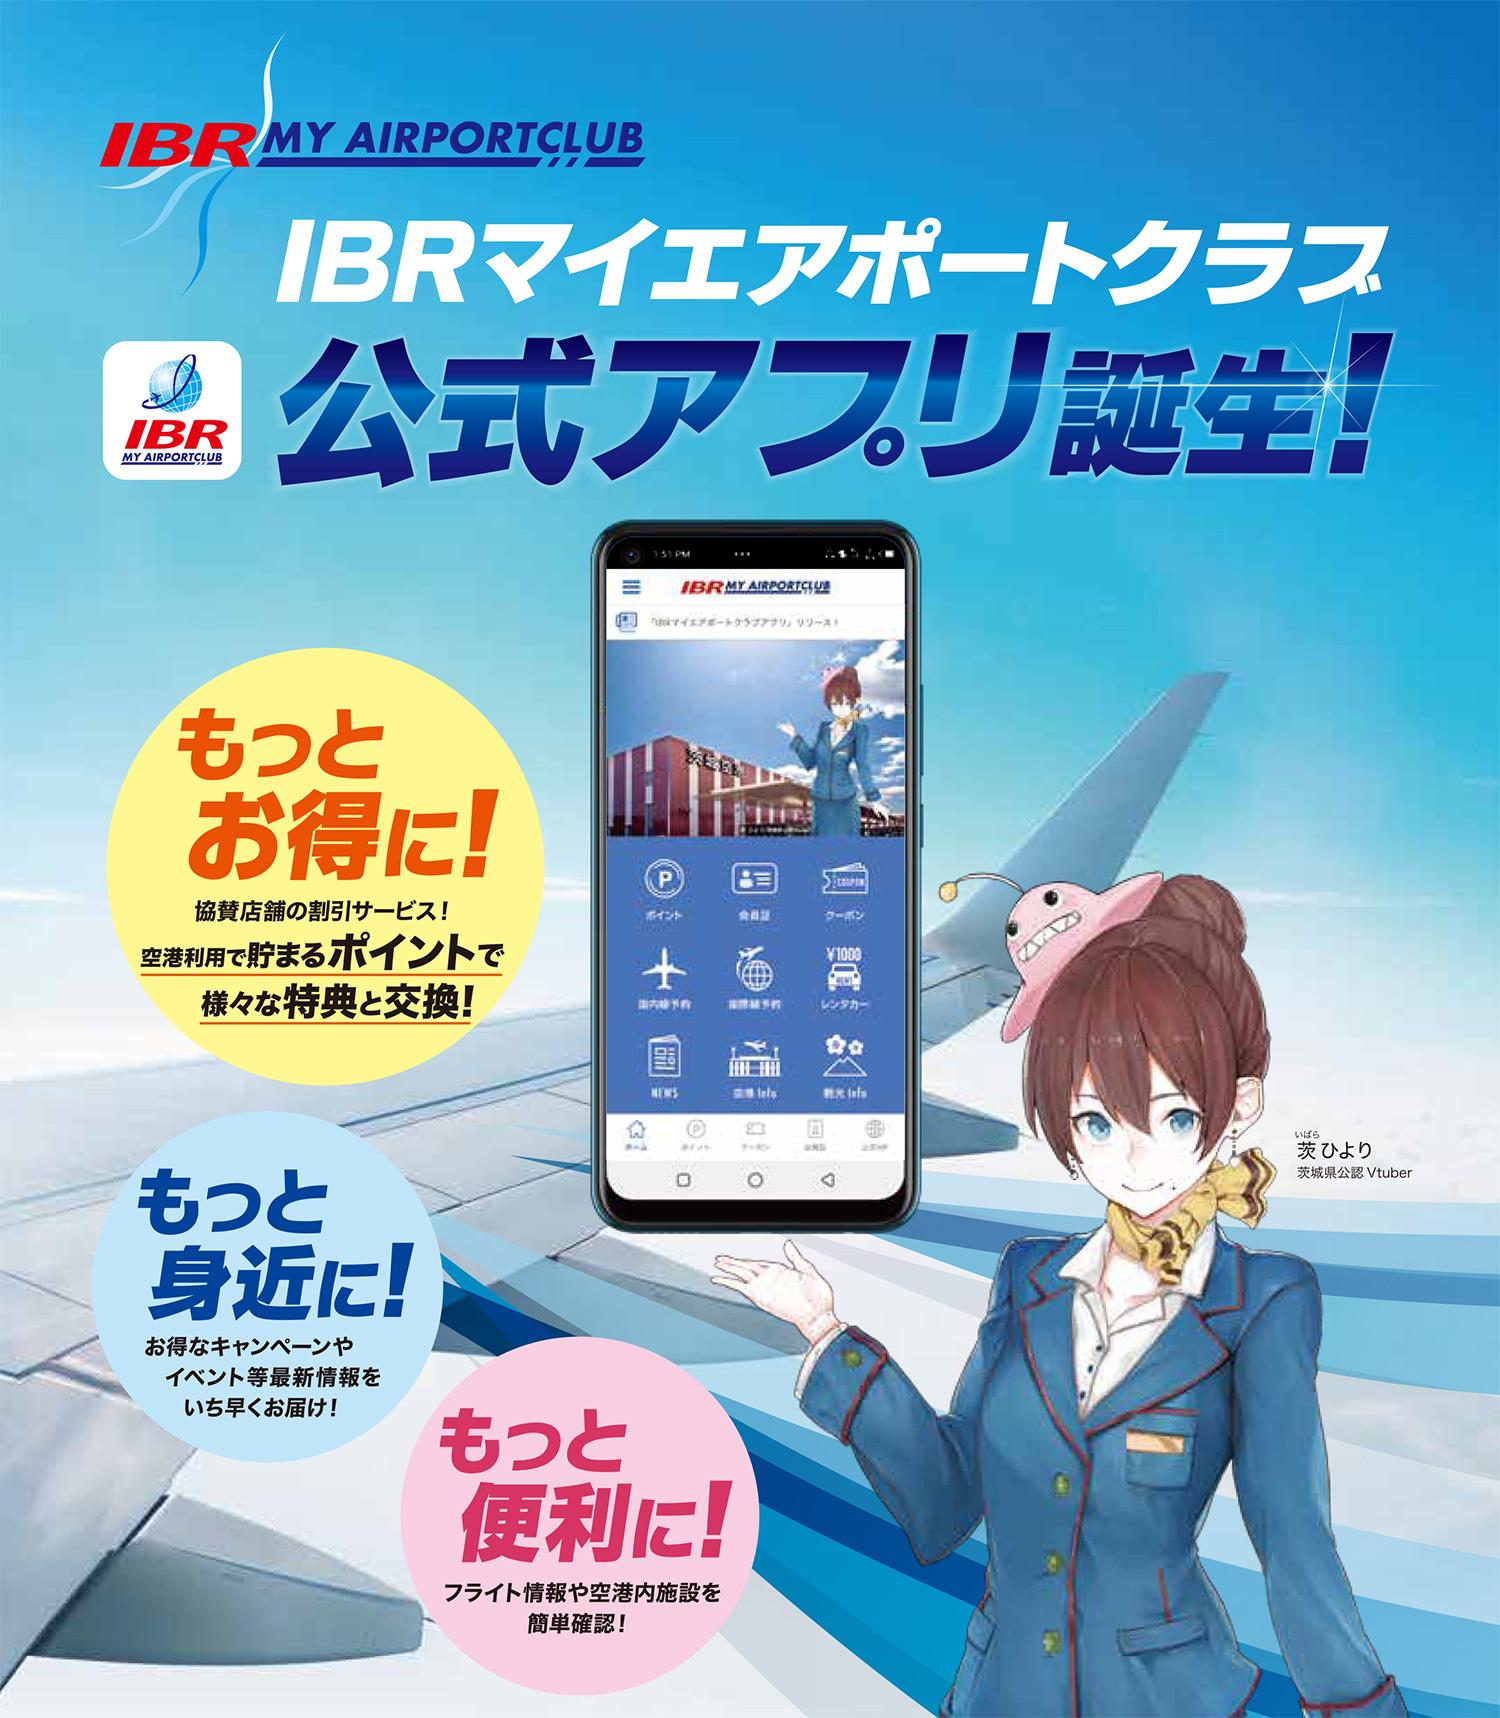 IBRマイエアポートクラブ公式アプリ